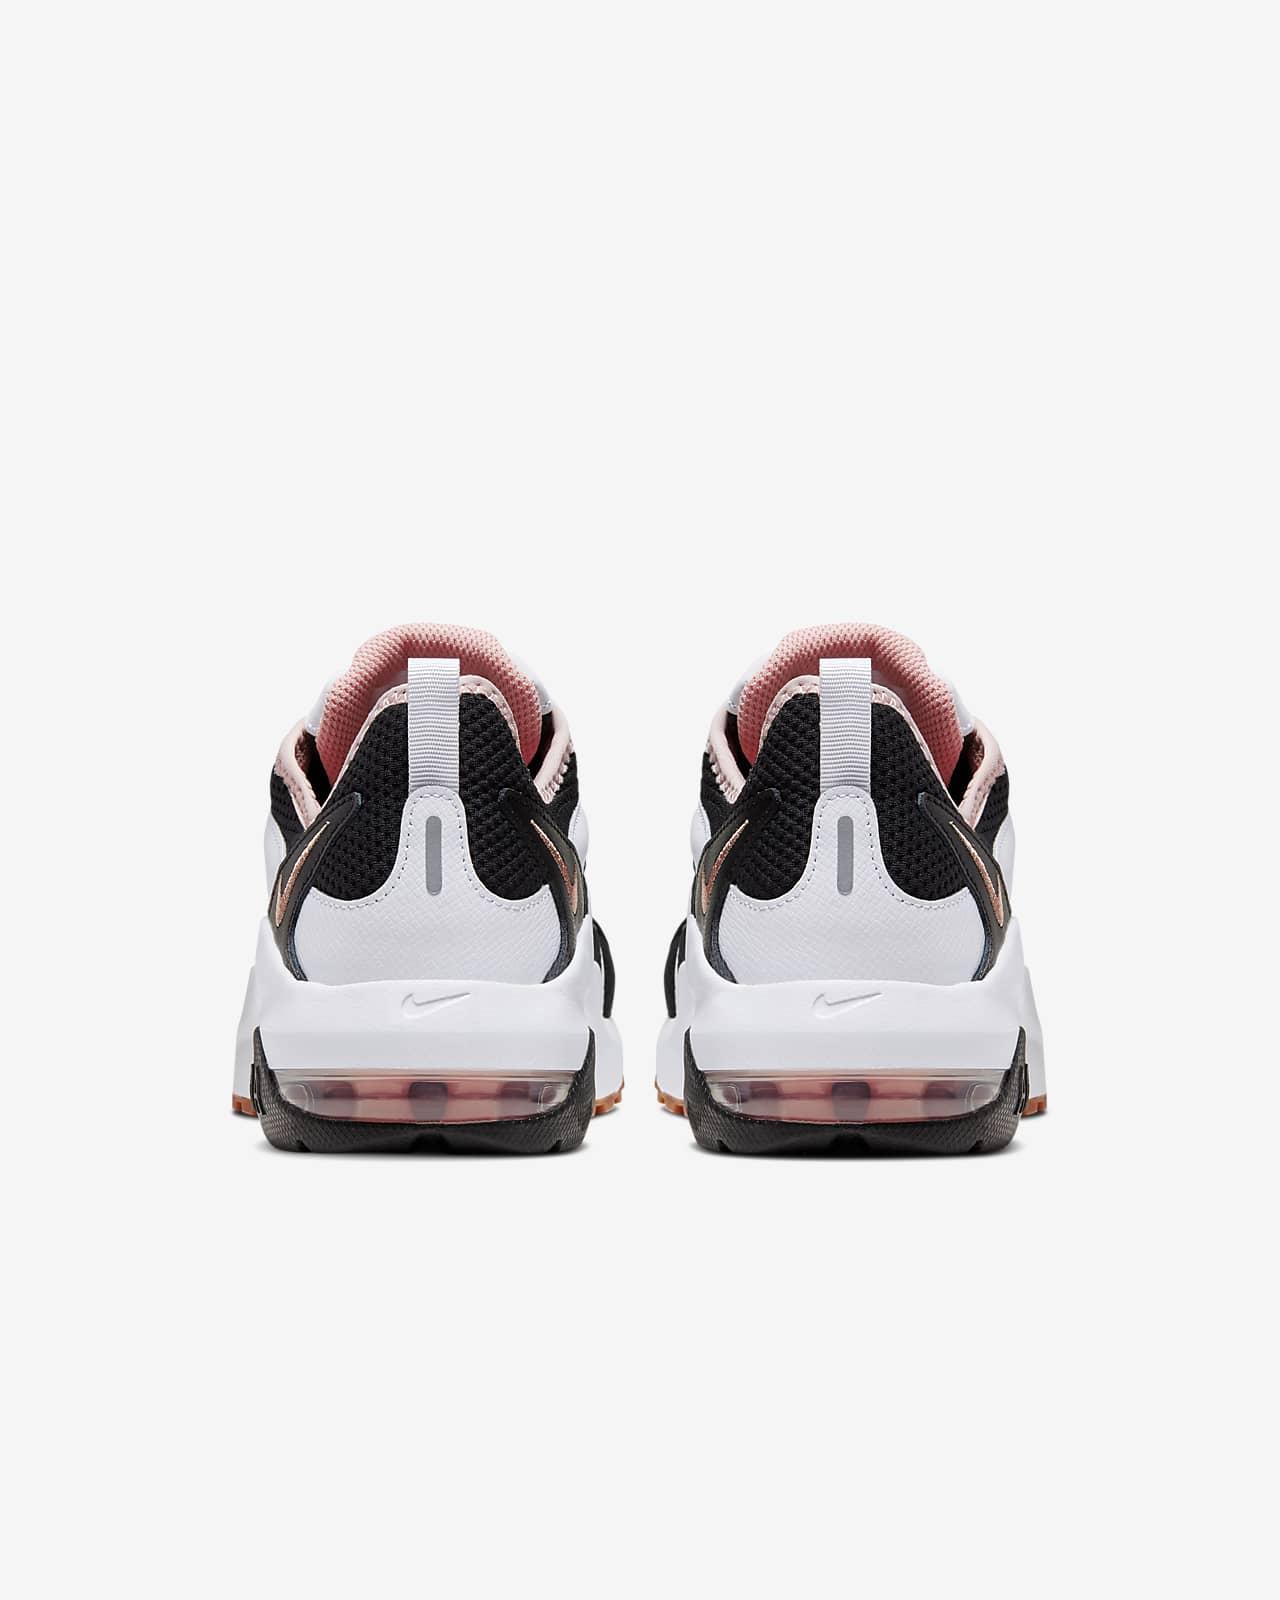 Nike Air Max Graviton női cipő. Nike HU